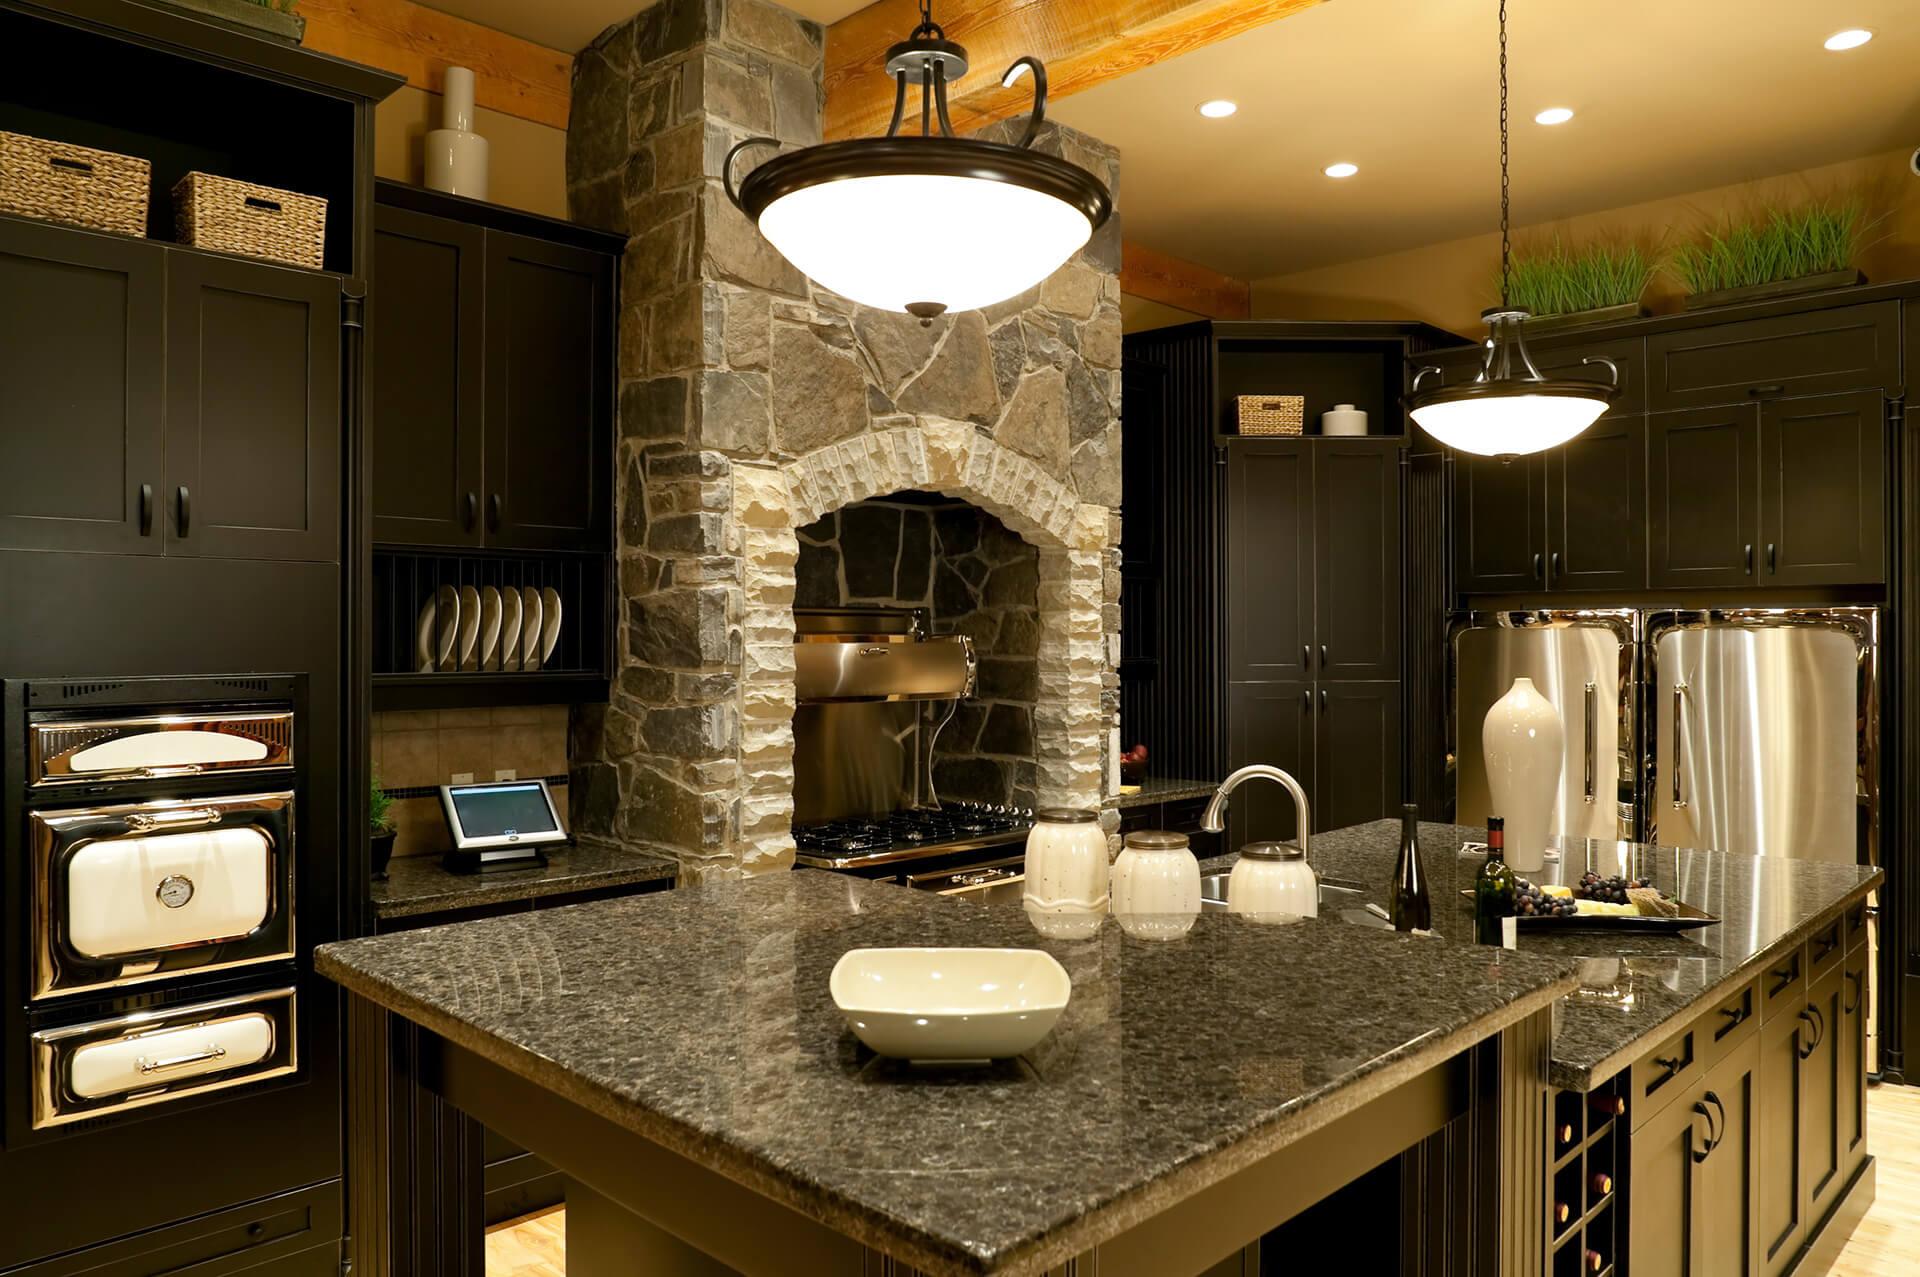 Kitchen Cabinets 101 - CabinetCorp